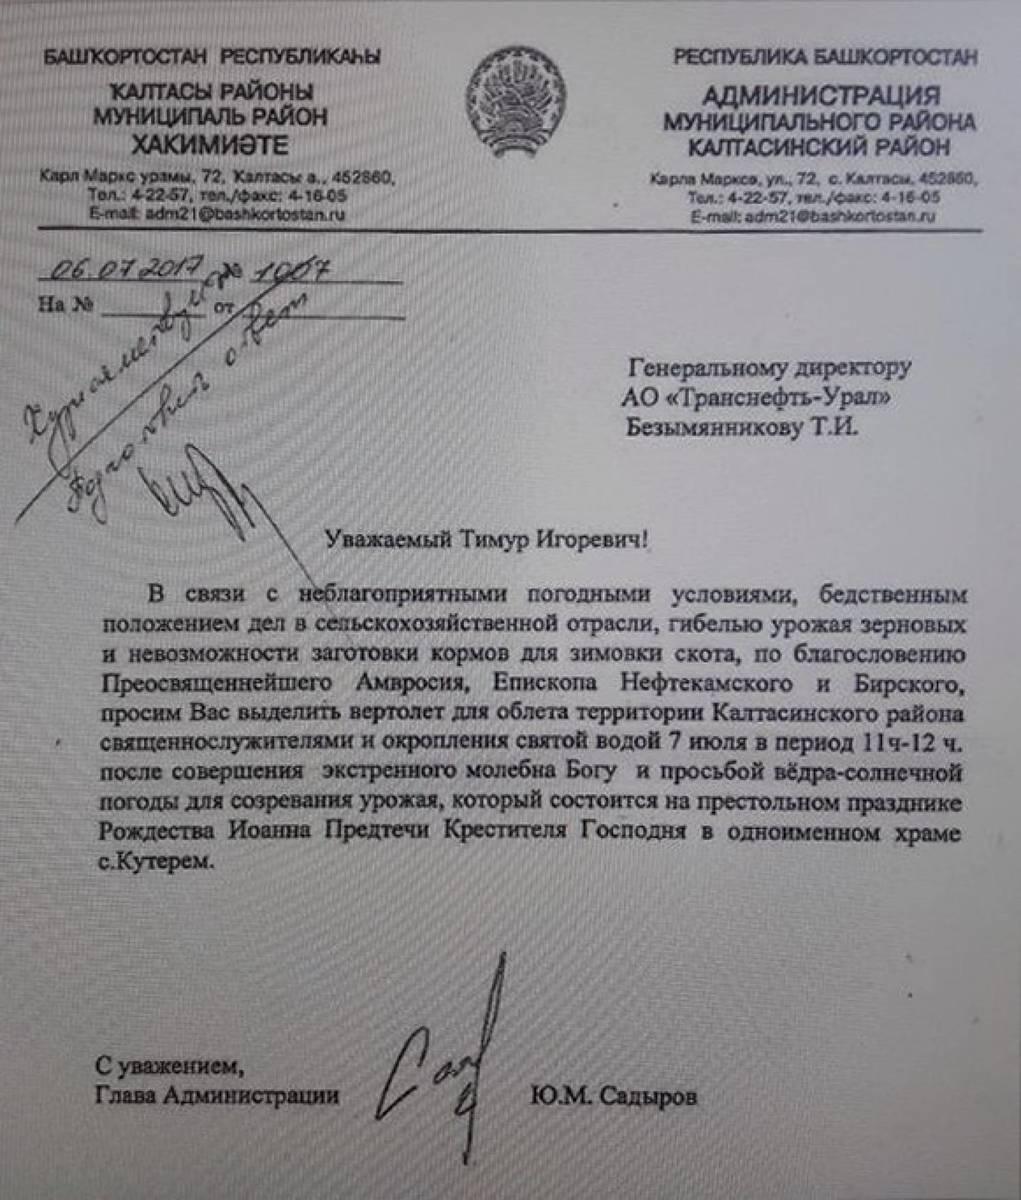 Фото: ГТРК «Башкортостан»